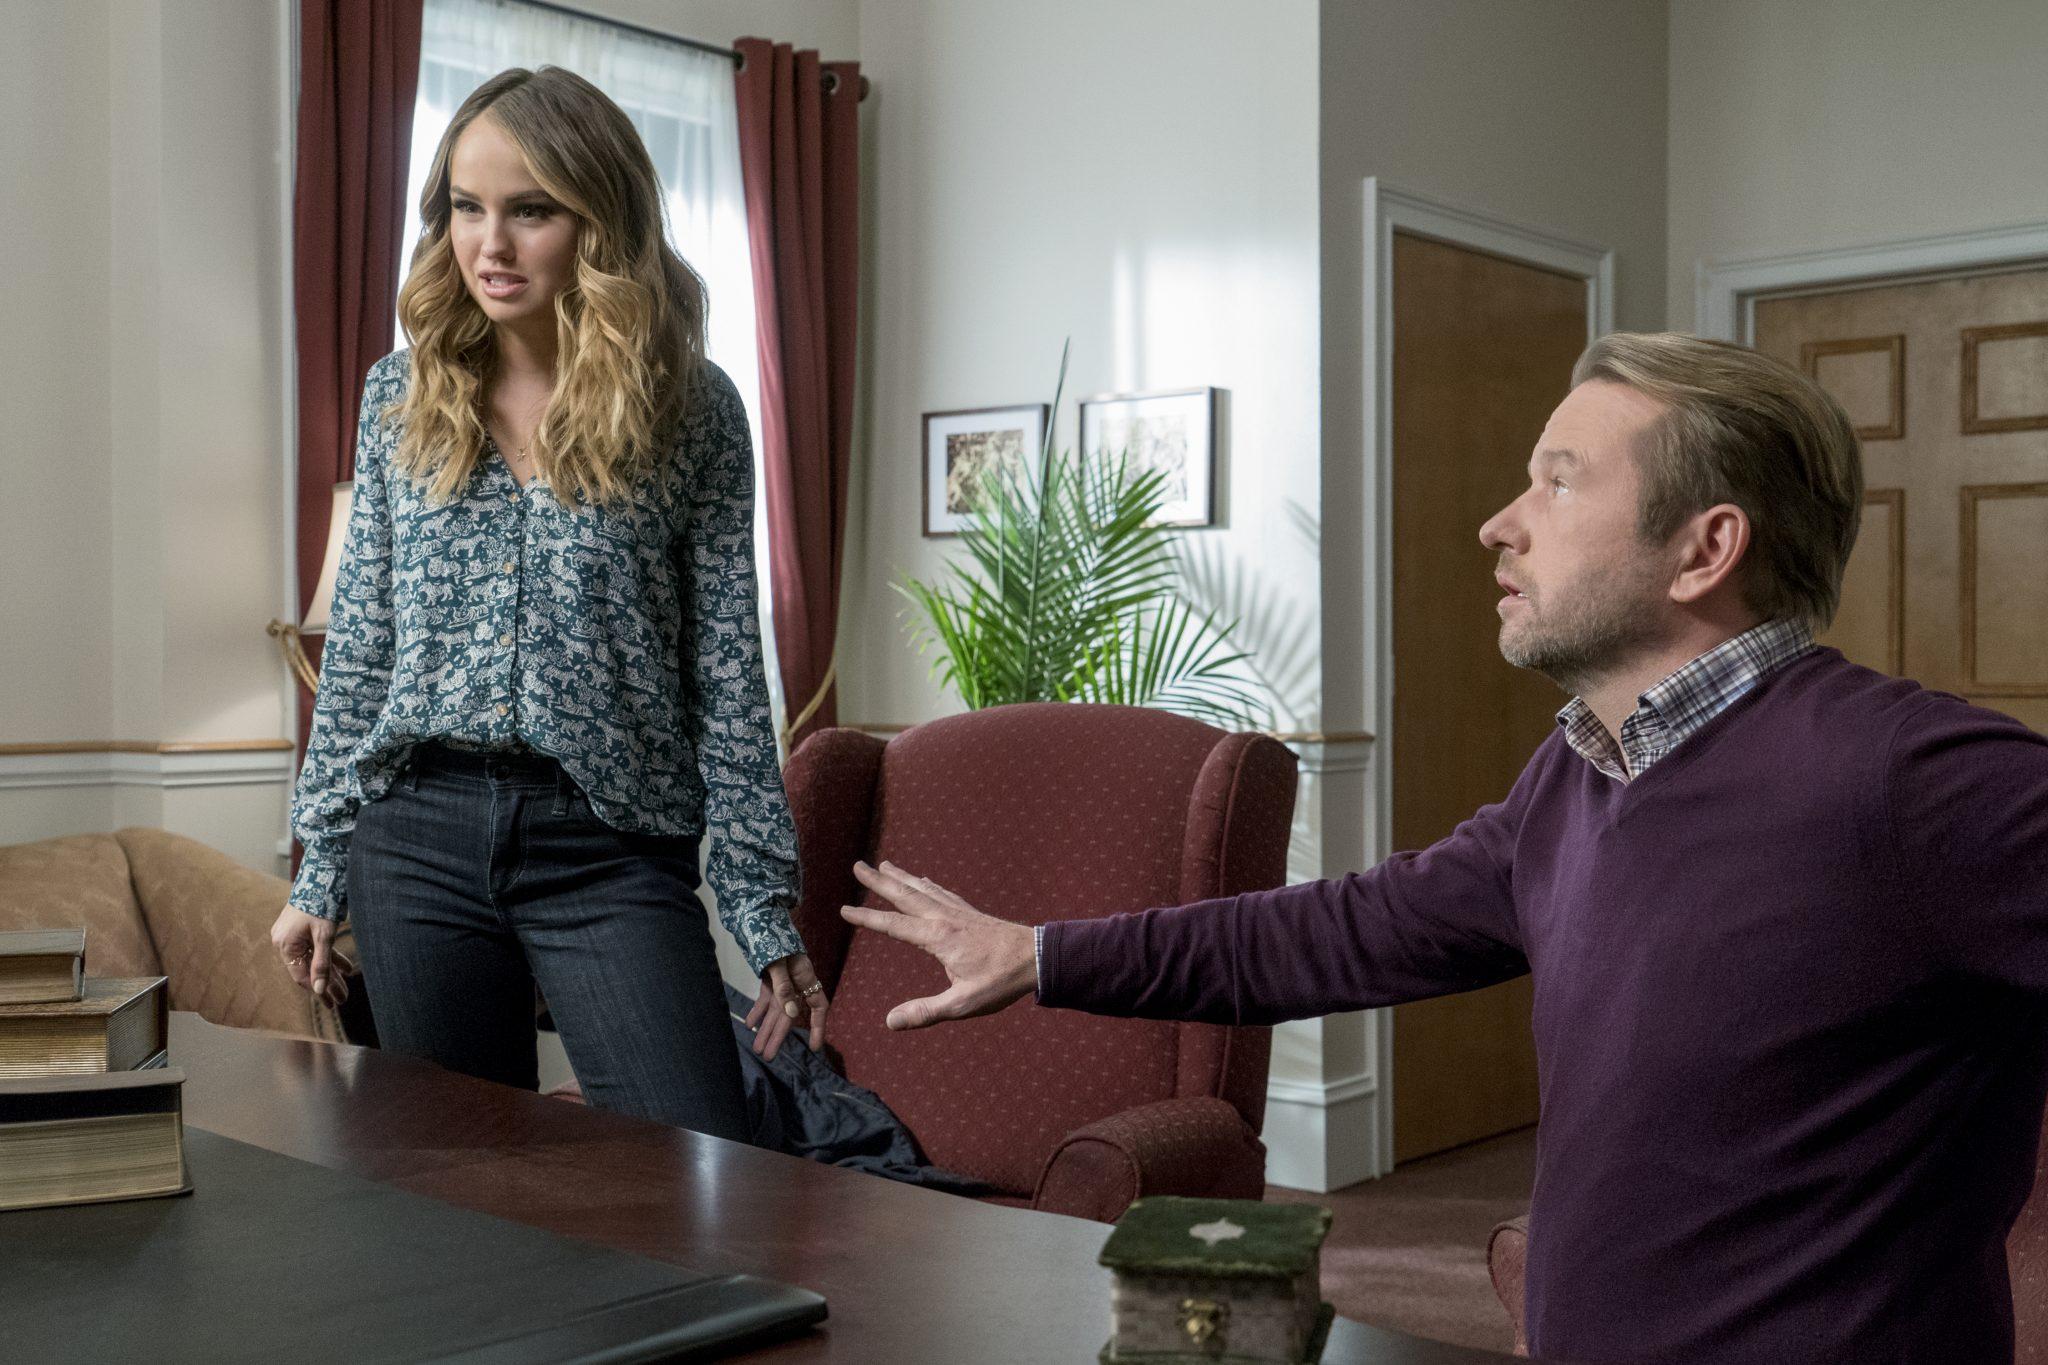 'Insatiable' Cancelled: No Season 3 For Debby Ryan Netflix Series